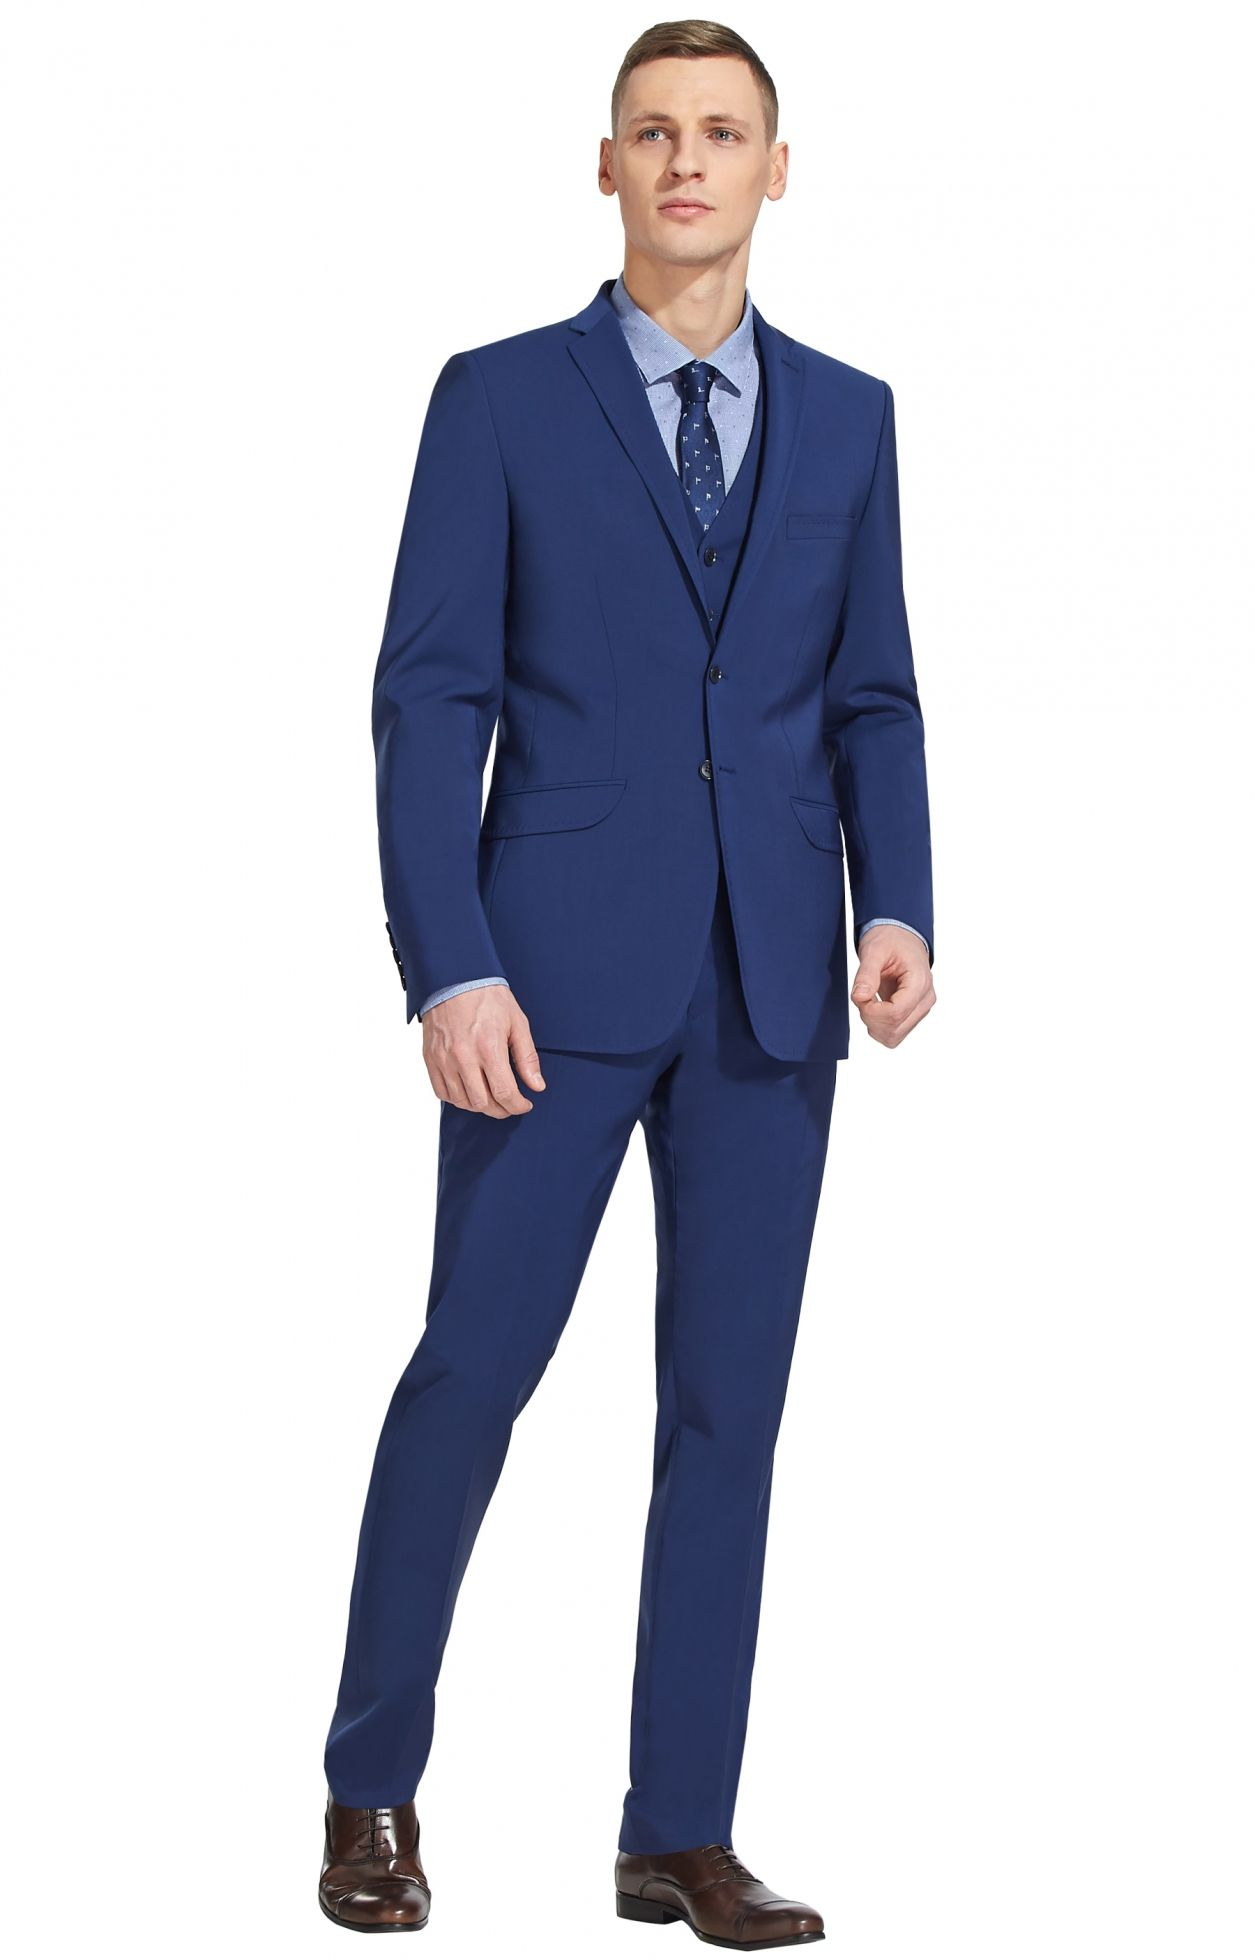 Garnitur 3 Cz 1699 00 Vistula Pl Suit Jacket Fashion Jackets